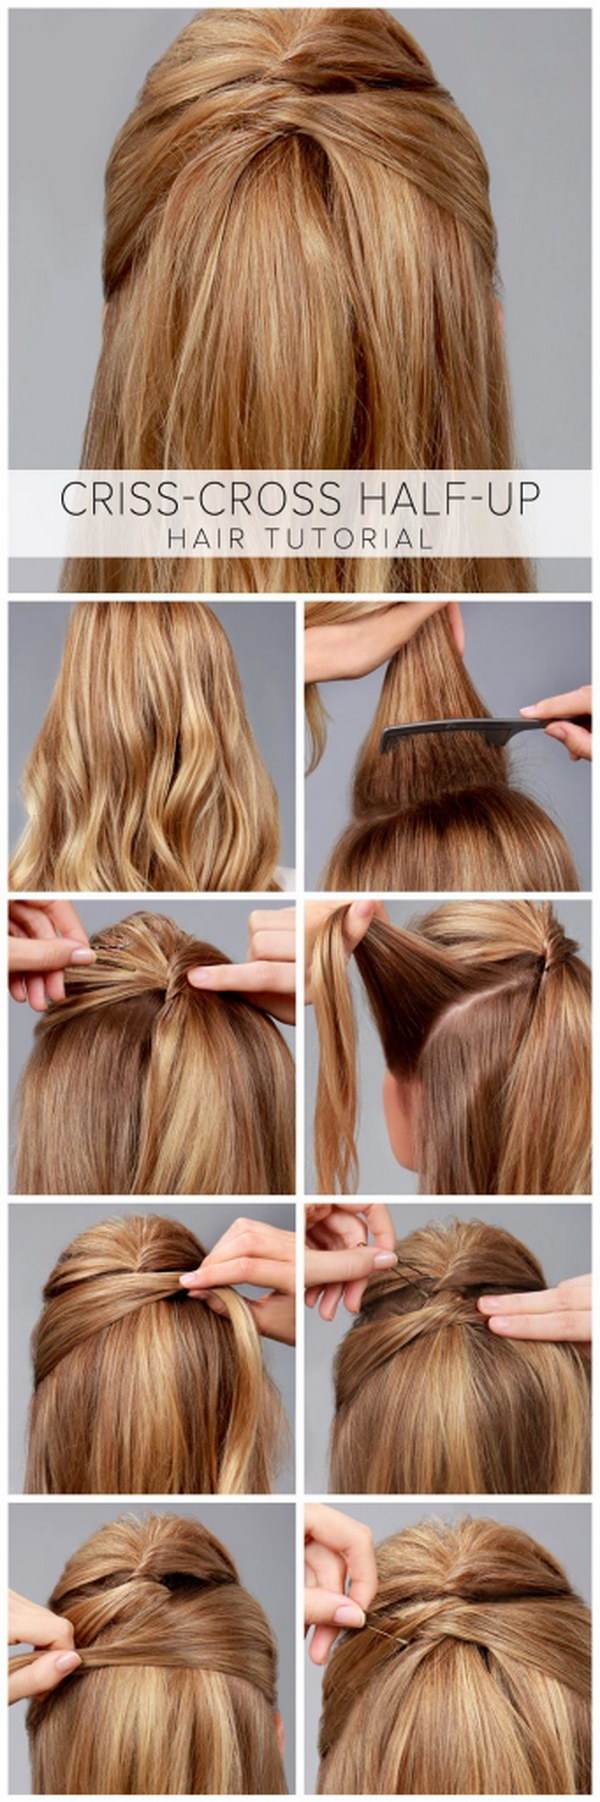 Groovy 55 Stunning Half Up Half Down Hairstyles Styletic Hairstyles For Men Maxibearus